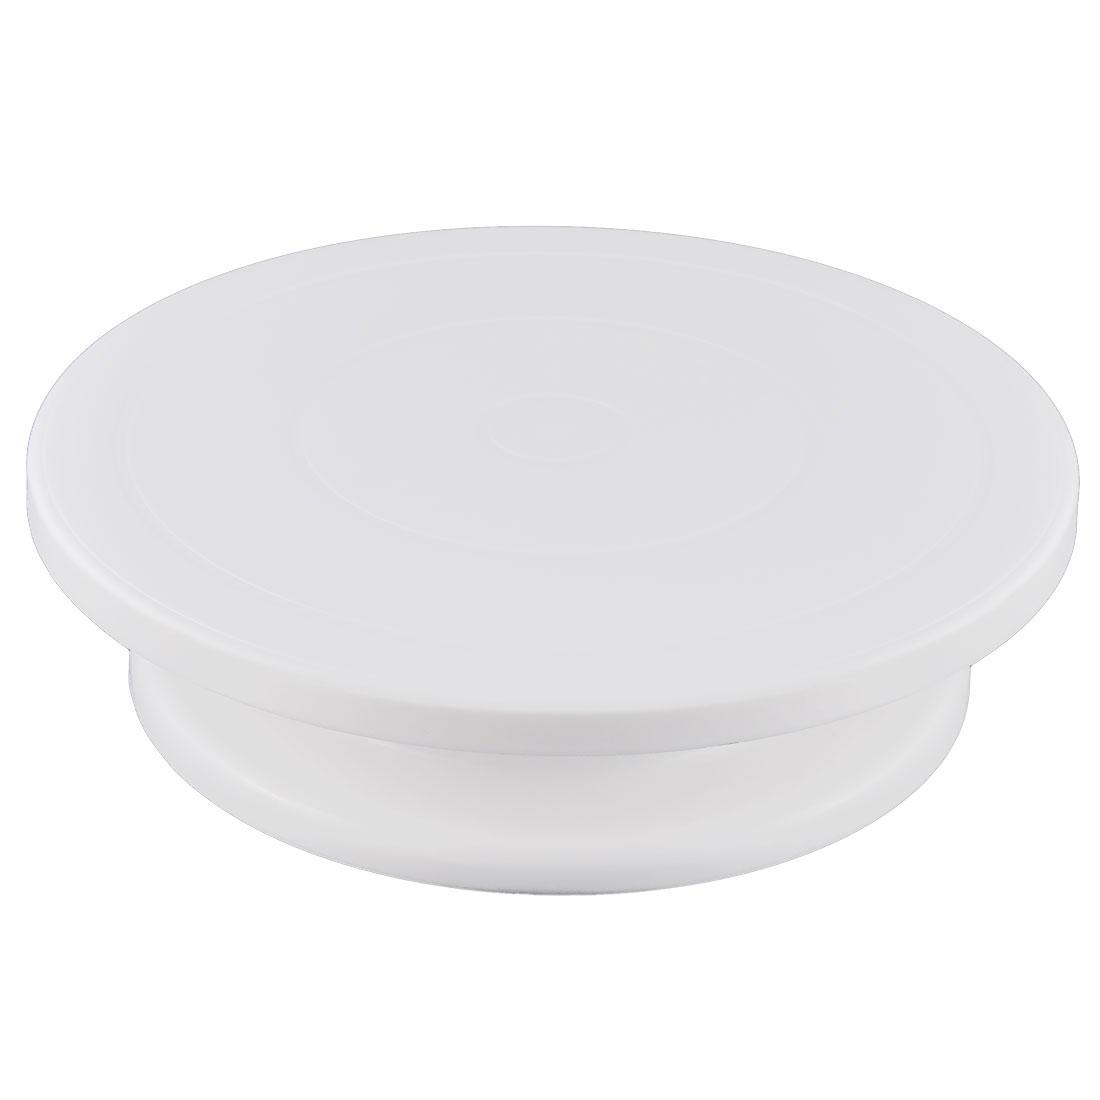 Plastic Revolving Rotating Dessert Stand Cake Decorating Making Tool Turntable White